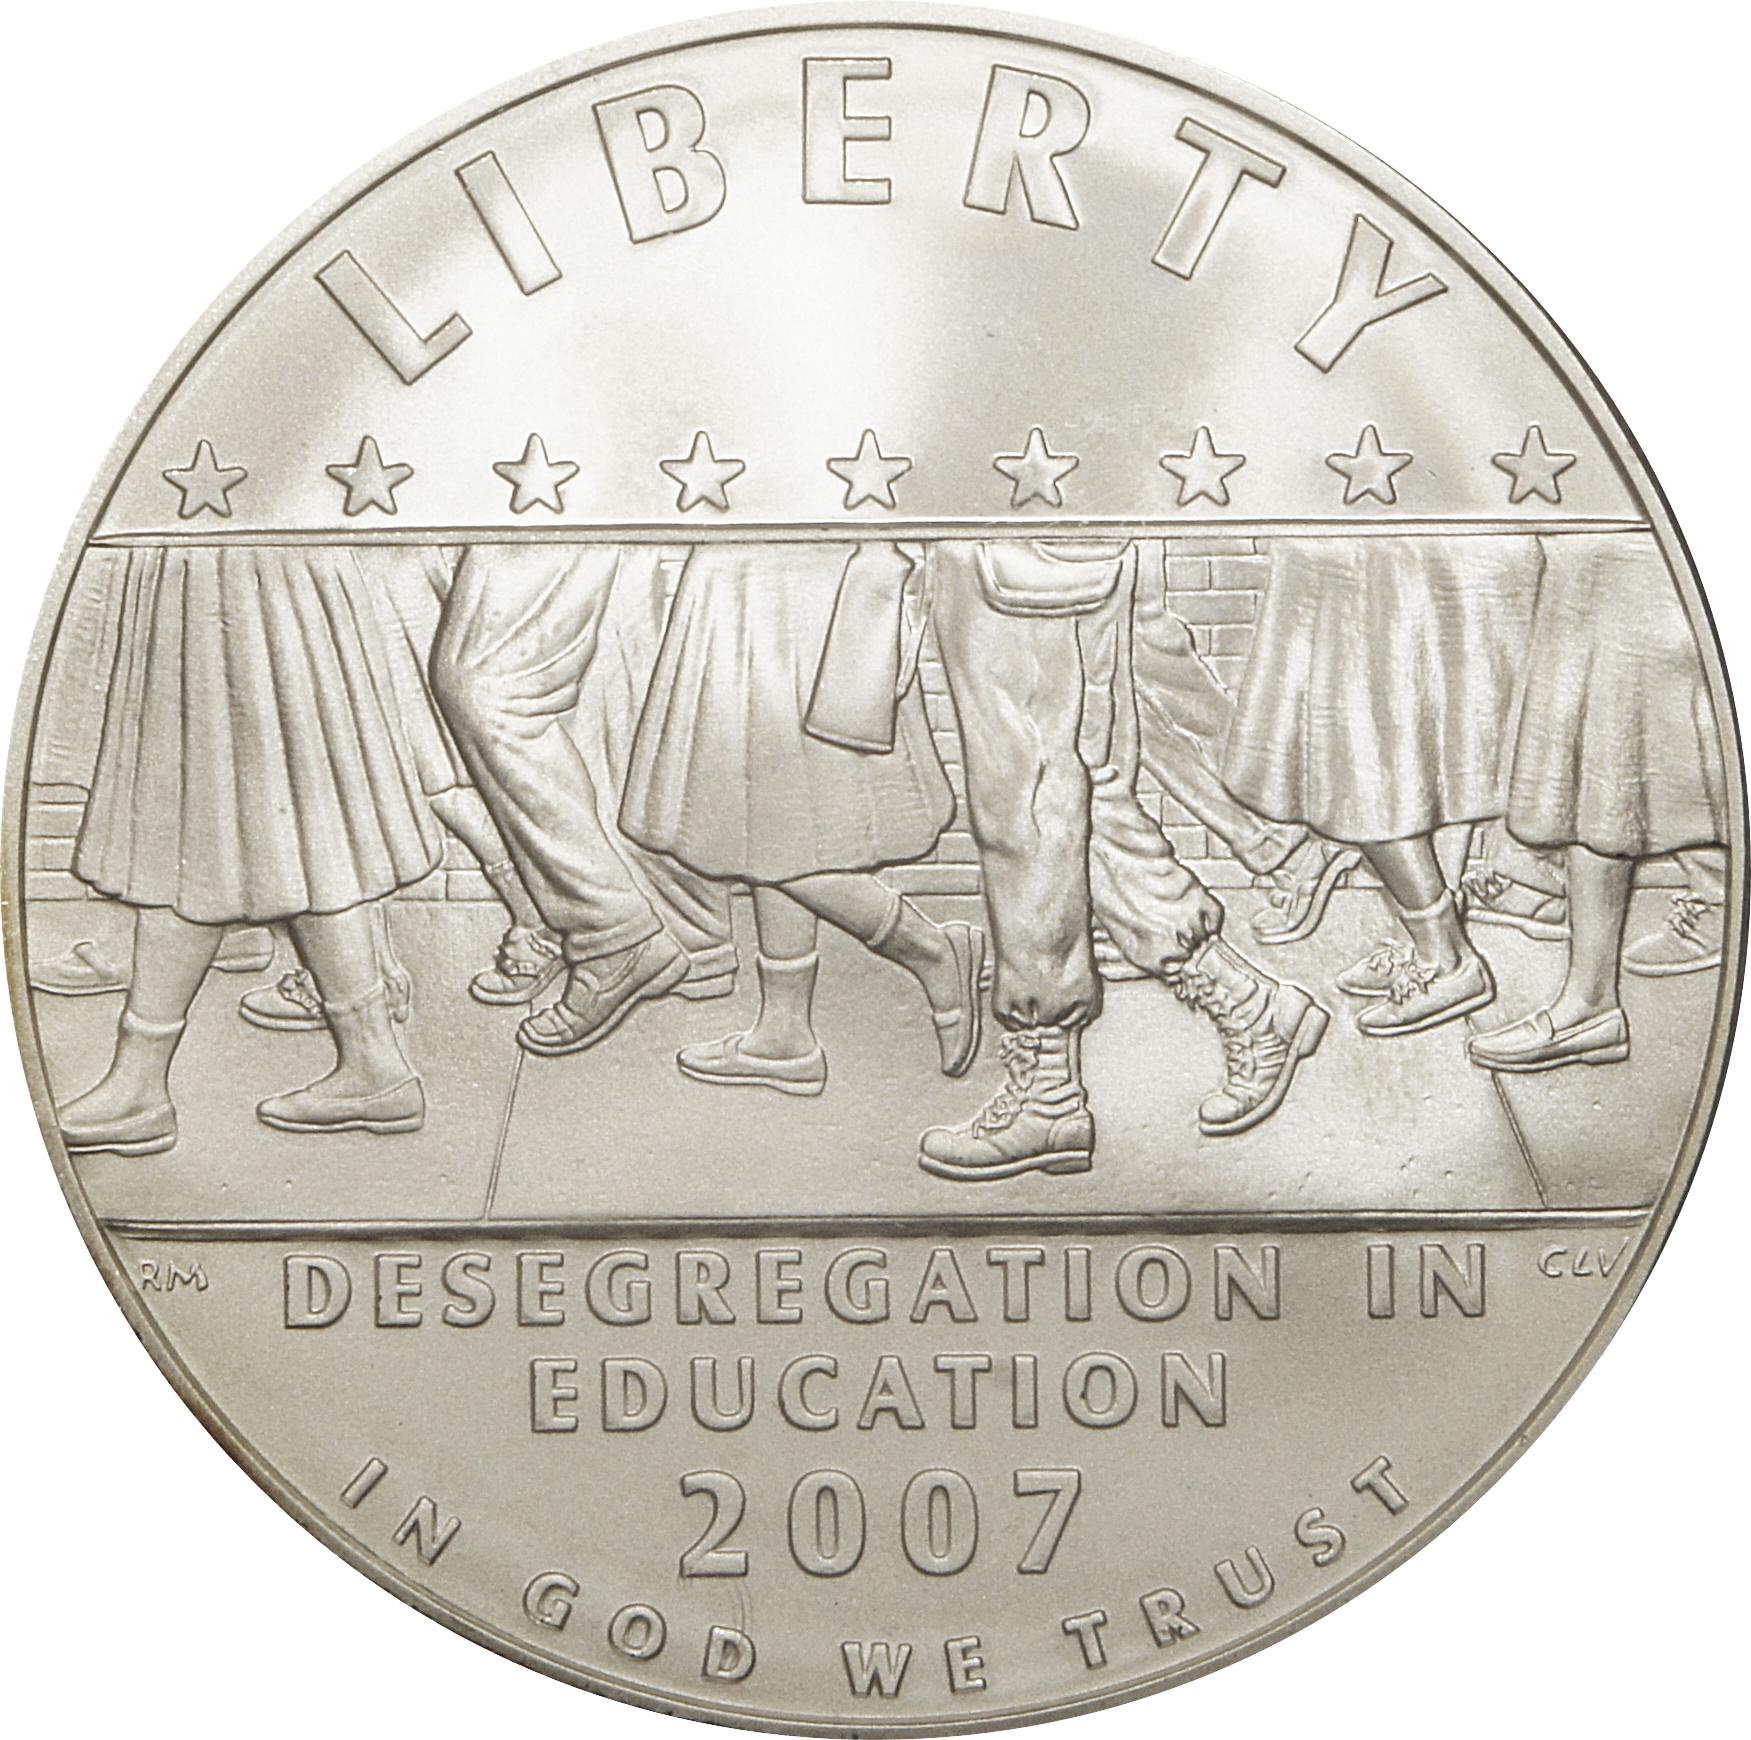 2007 BU Little Rock Central High School US Mint Commemorative Silver Dollar Coin